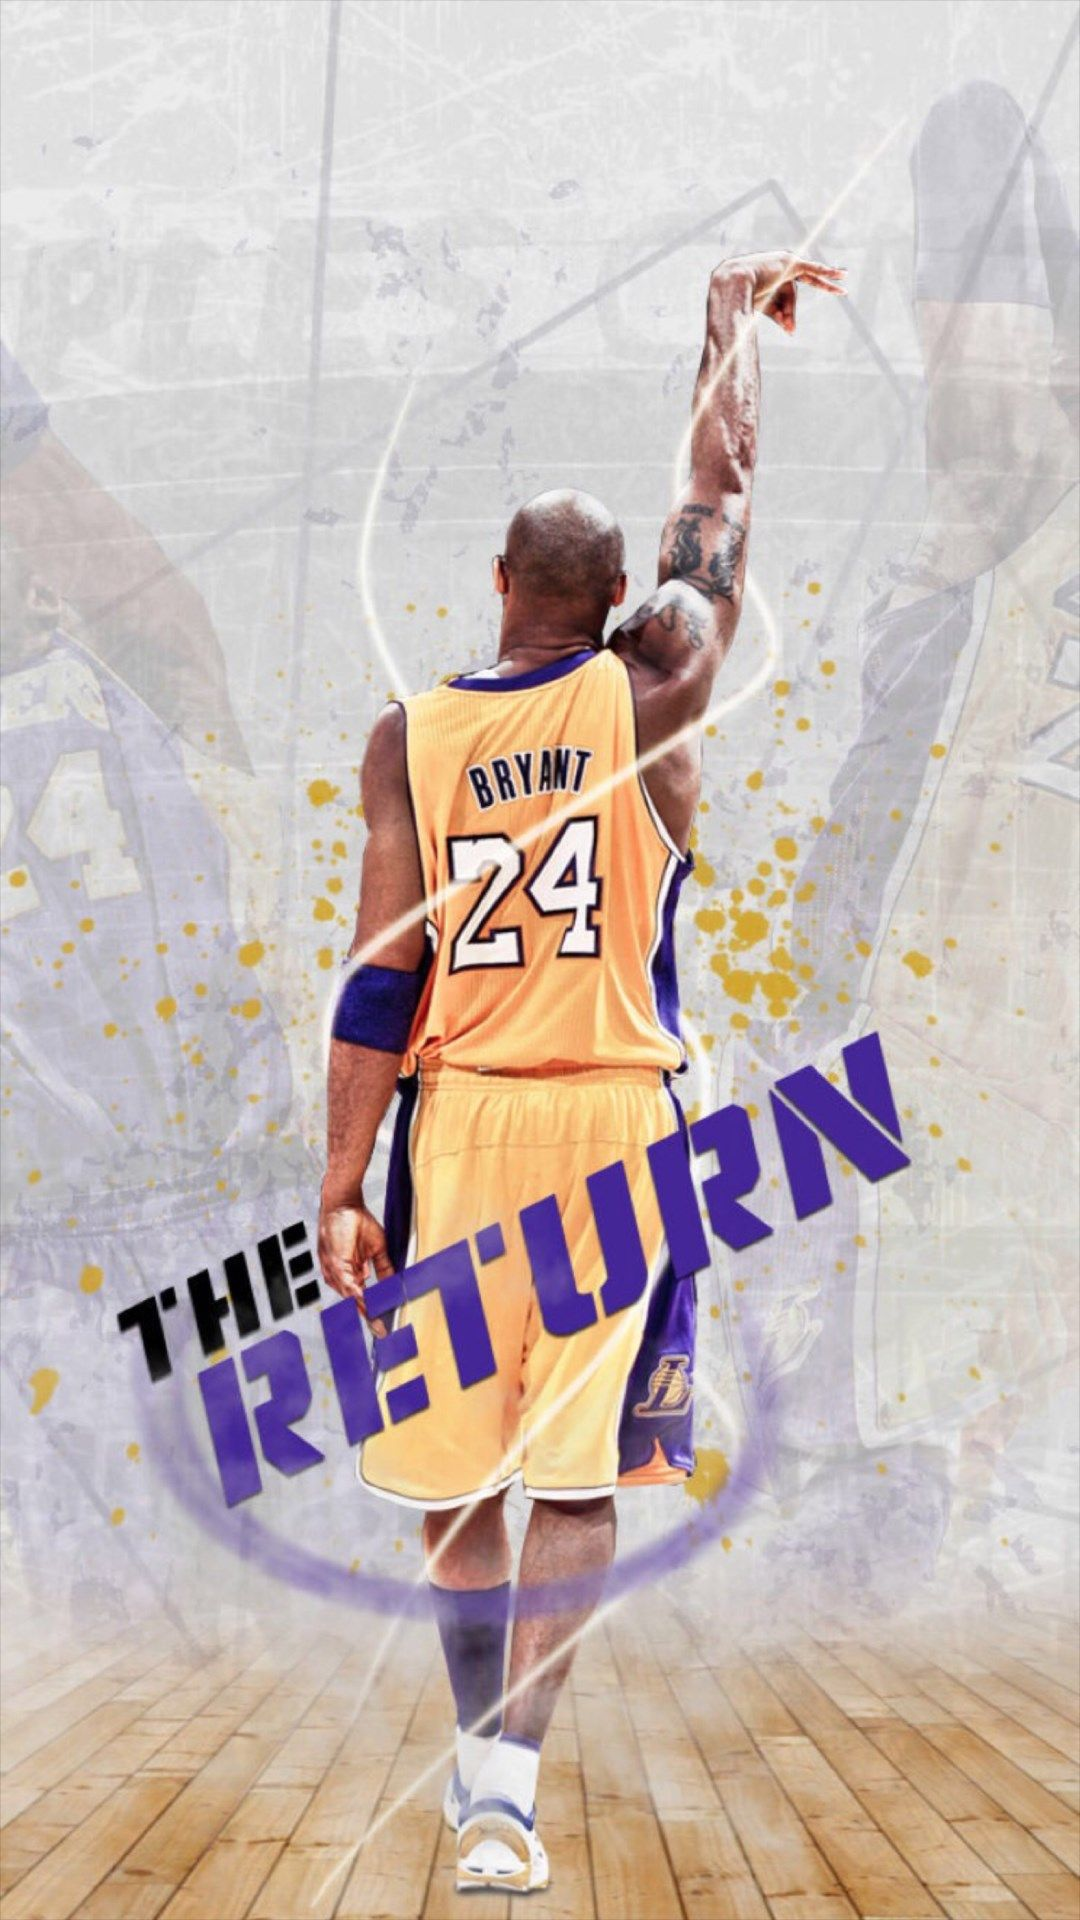 Free Download The Bryant Kobe Nba Sports Super Star Wallpaper Beaty Your Iphone Sports Board Bac In 2020 Kobe Bryant Wallpaper Lakers Kobe Bryant Kobe Bryant Nba